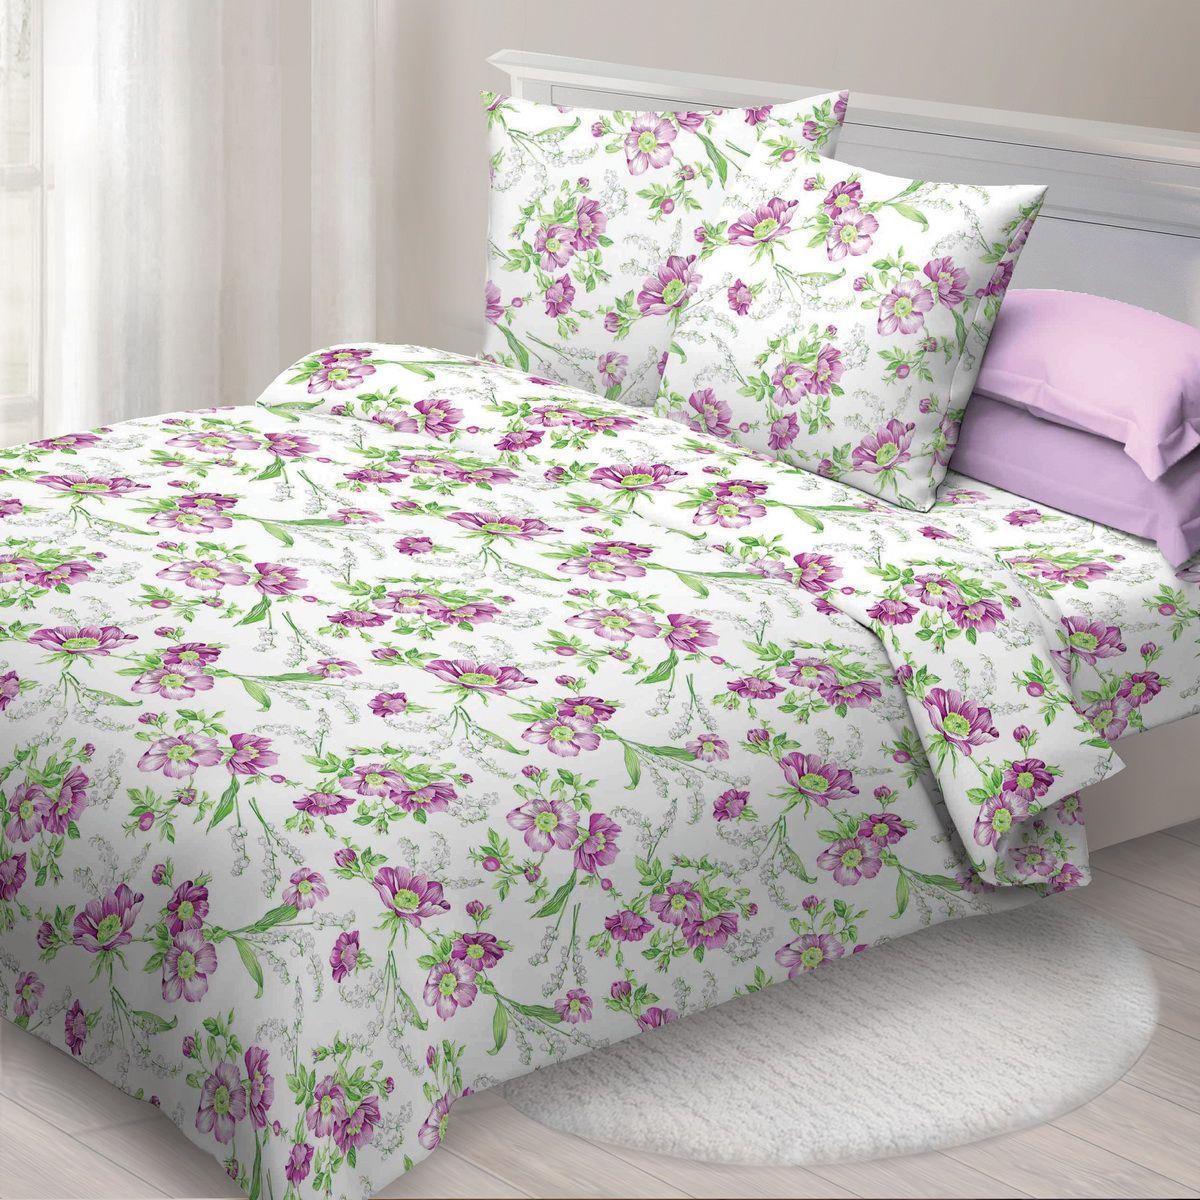 Комплект белья Спал Спалыч Монмартр, евро, наволочки 70x70, цвет: розовый недорогое